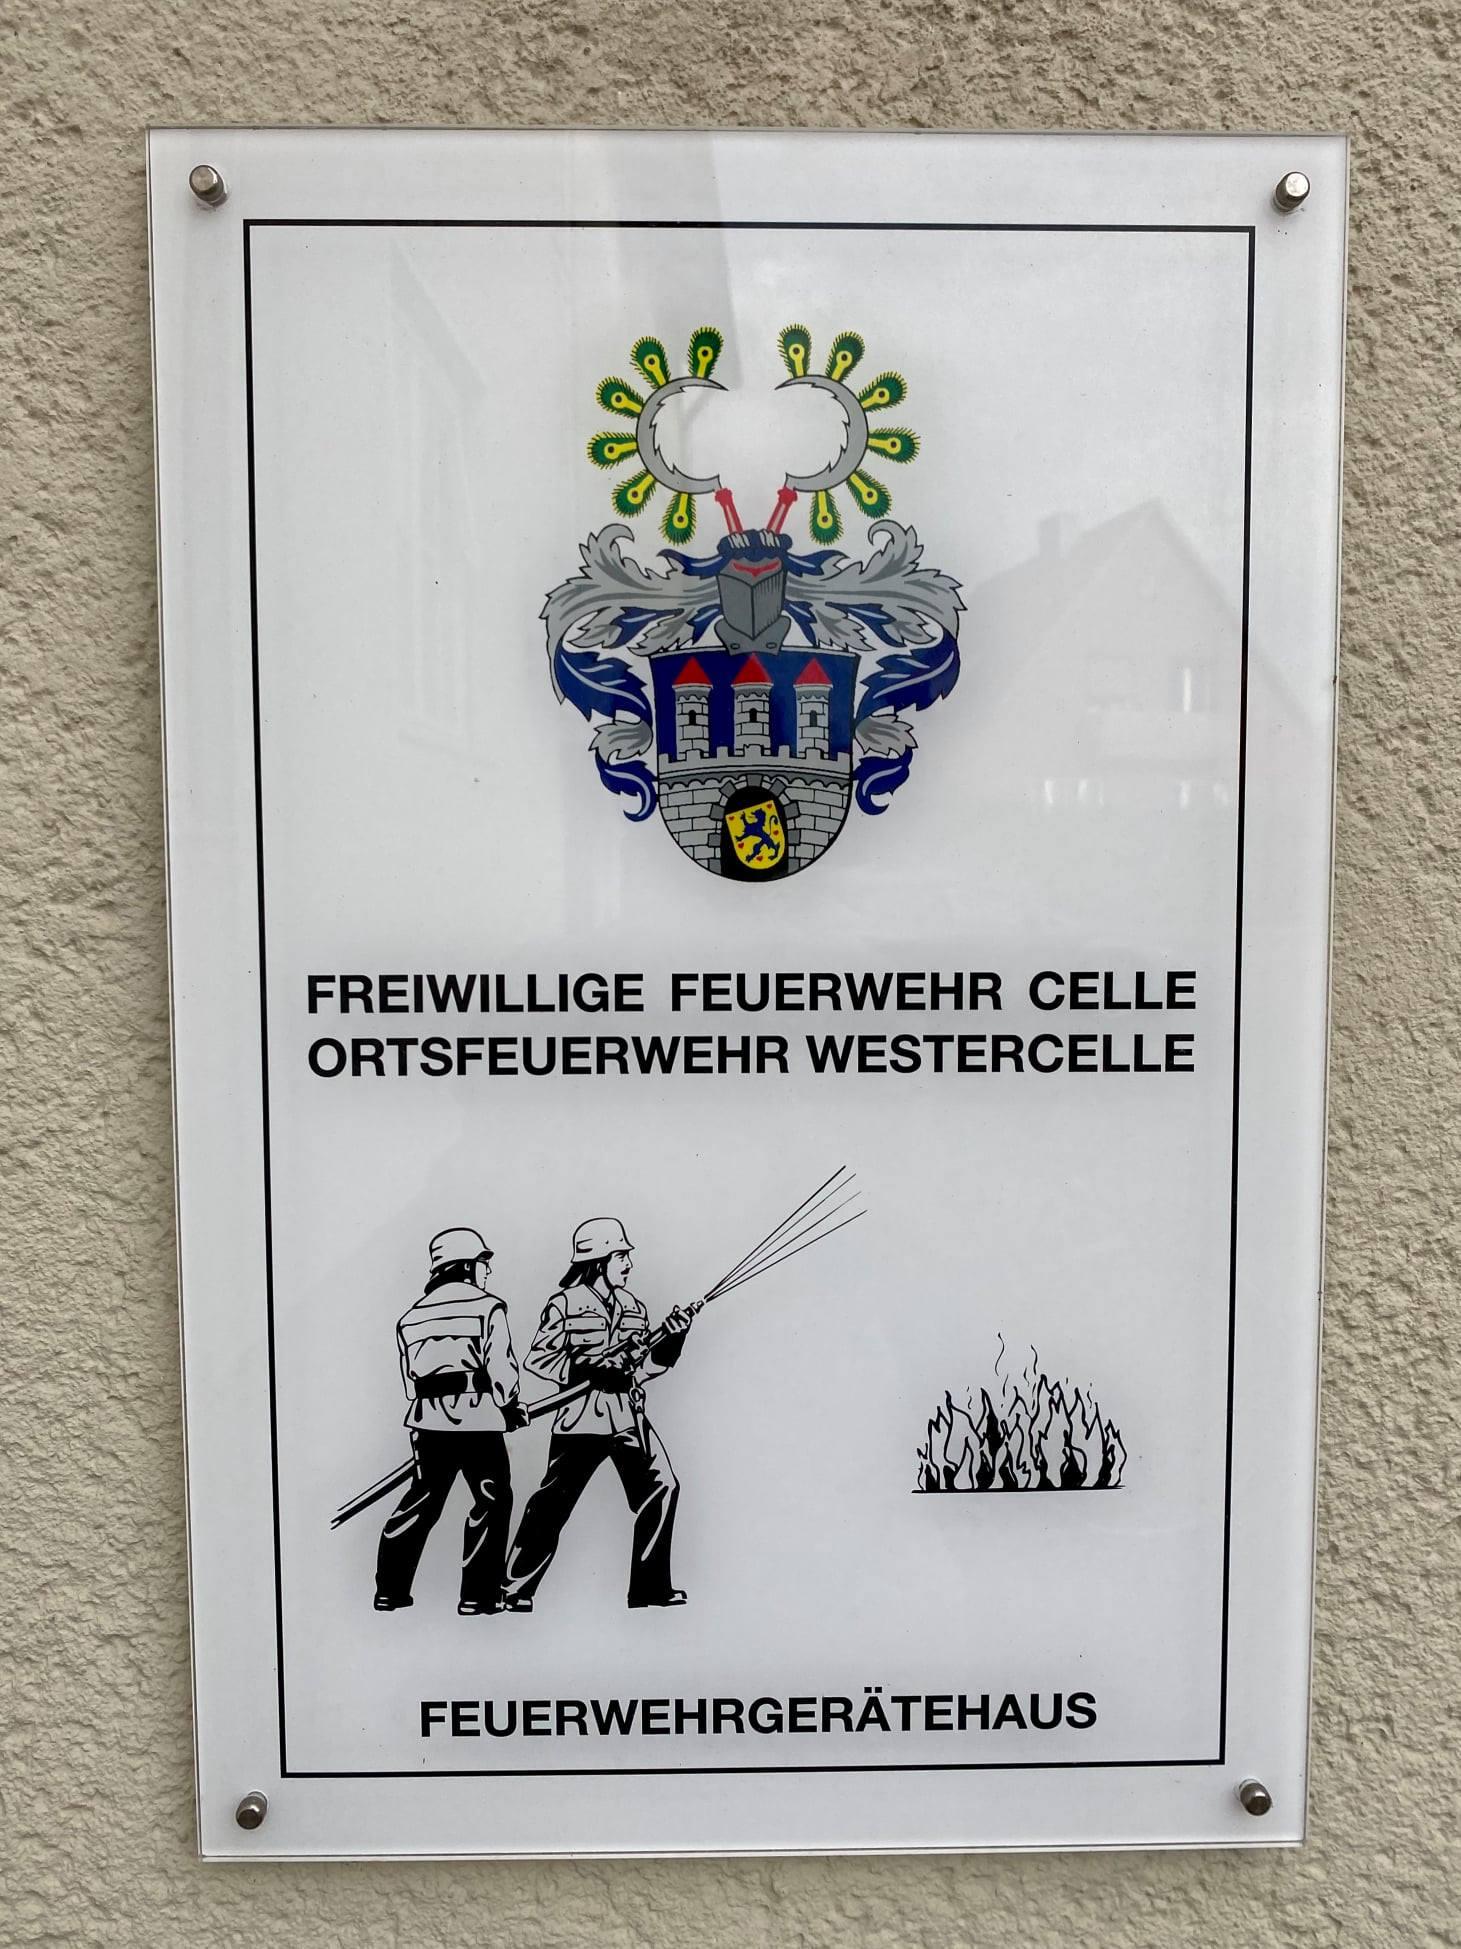 Feuerwehr Westercelle